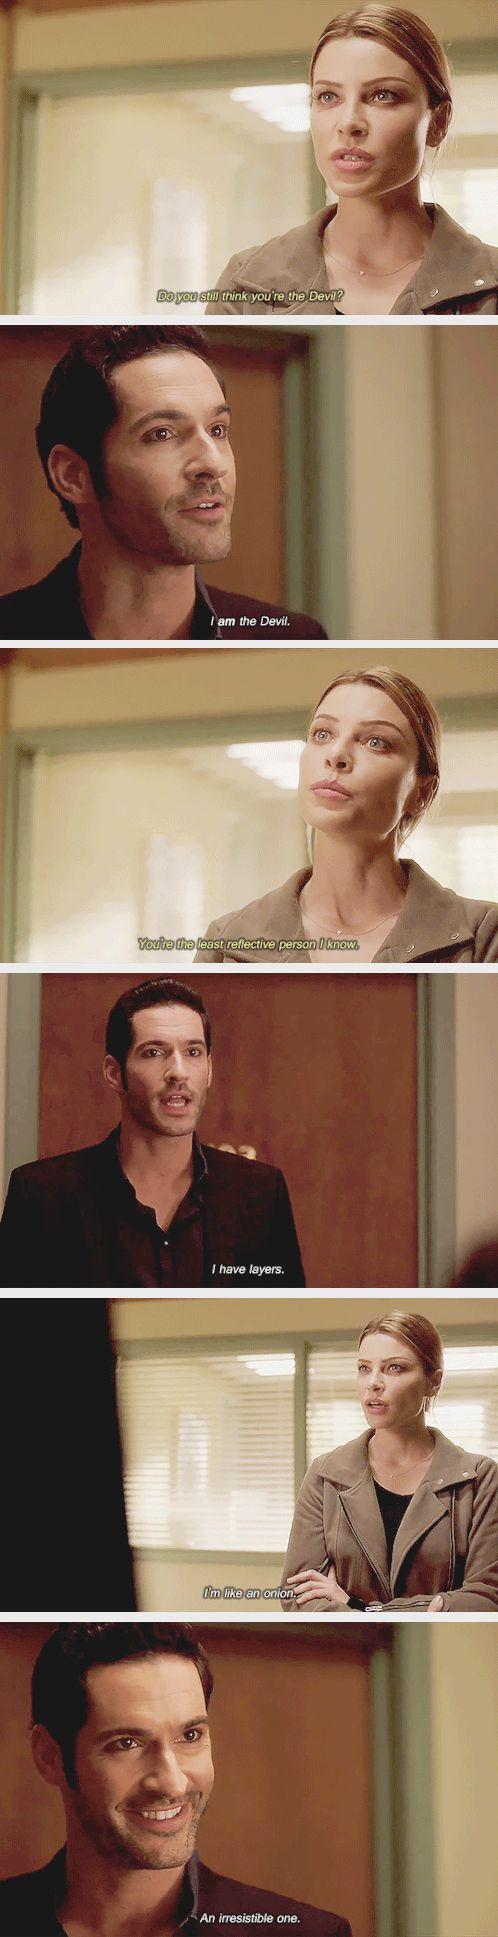 #LuciferMorningstar #ChloeDecker #Clucifer #Deckerstar S01E08 - Et Tu, Doctor?